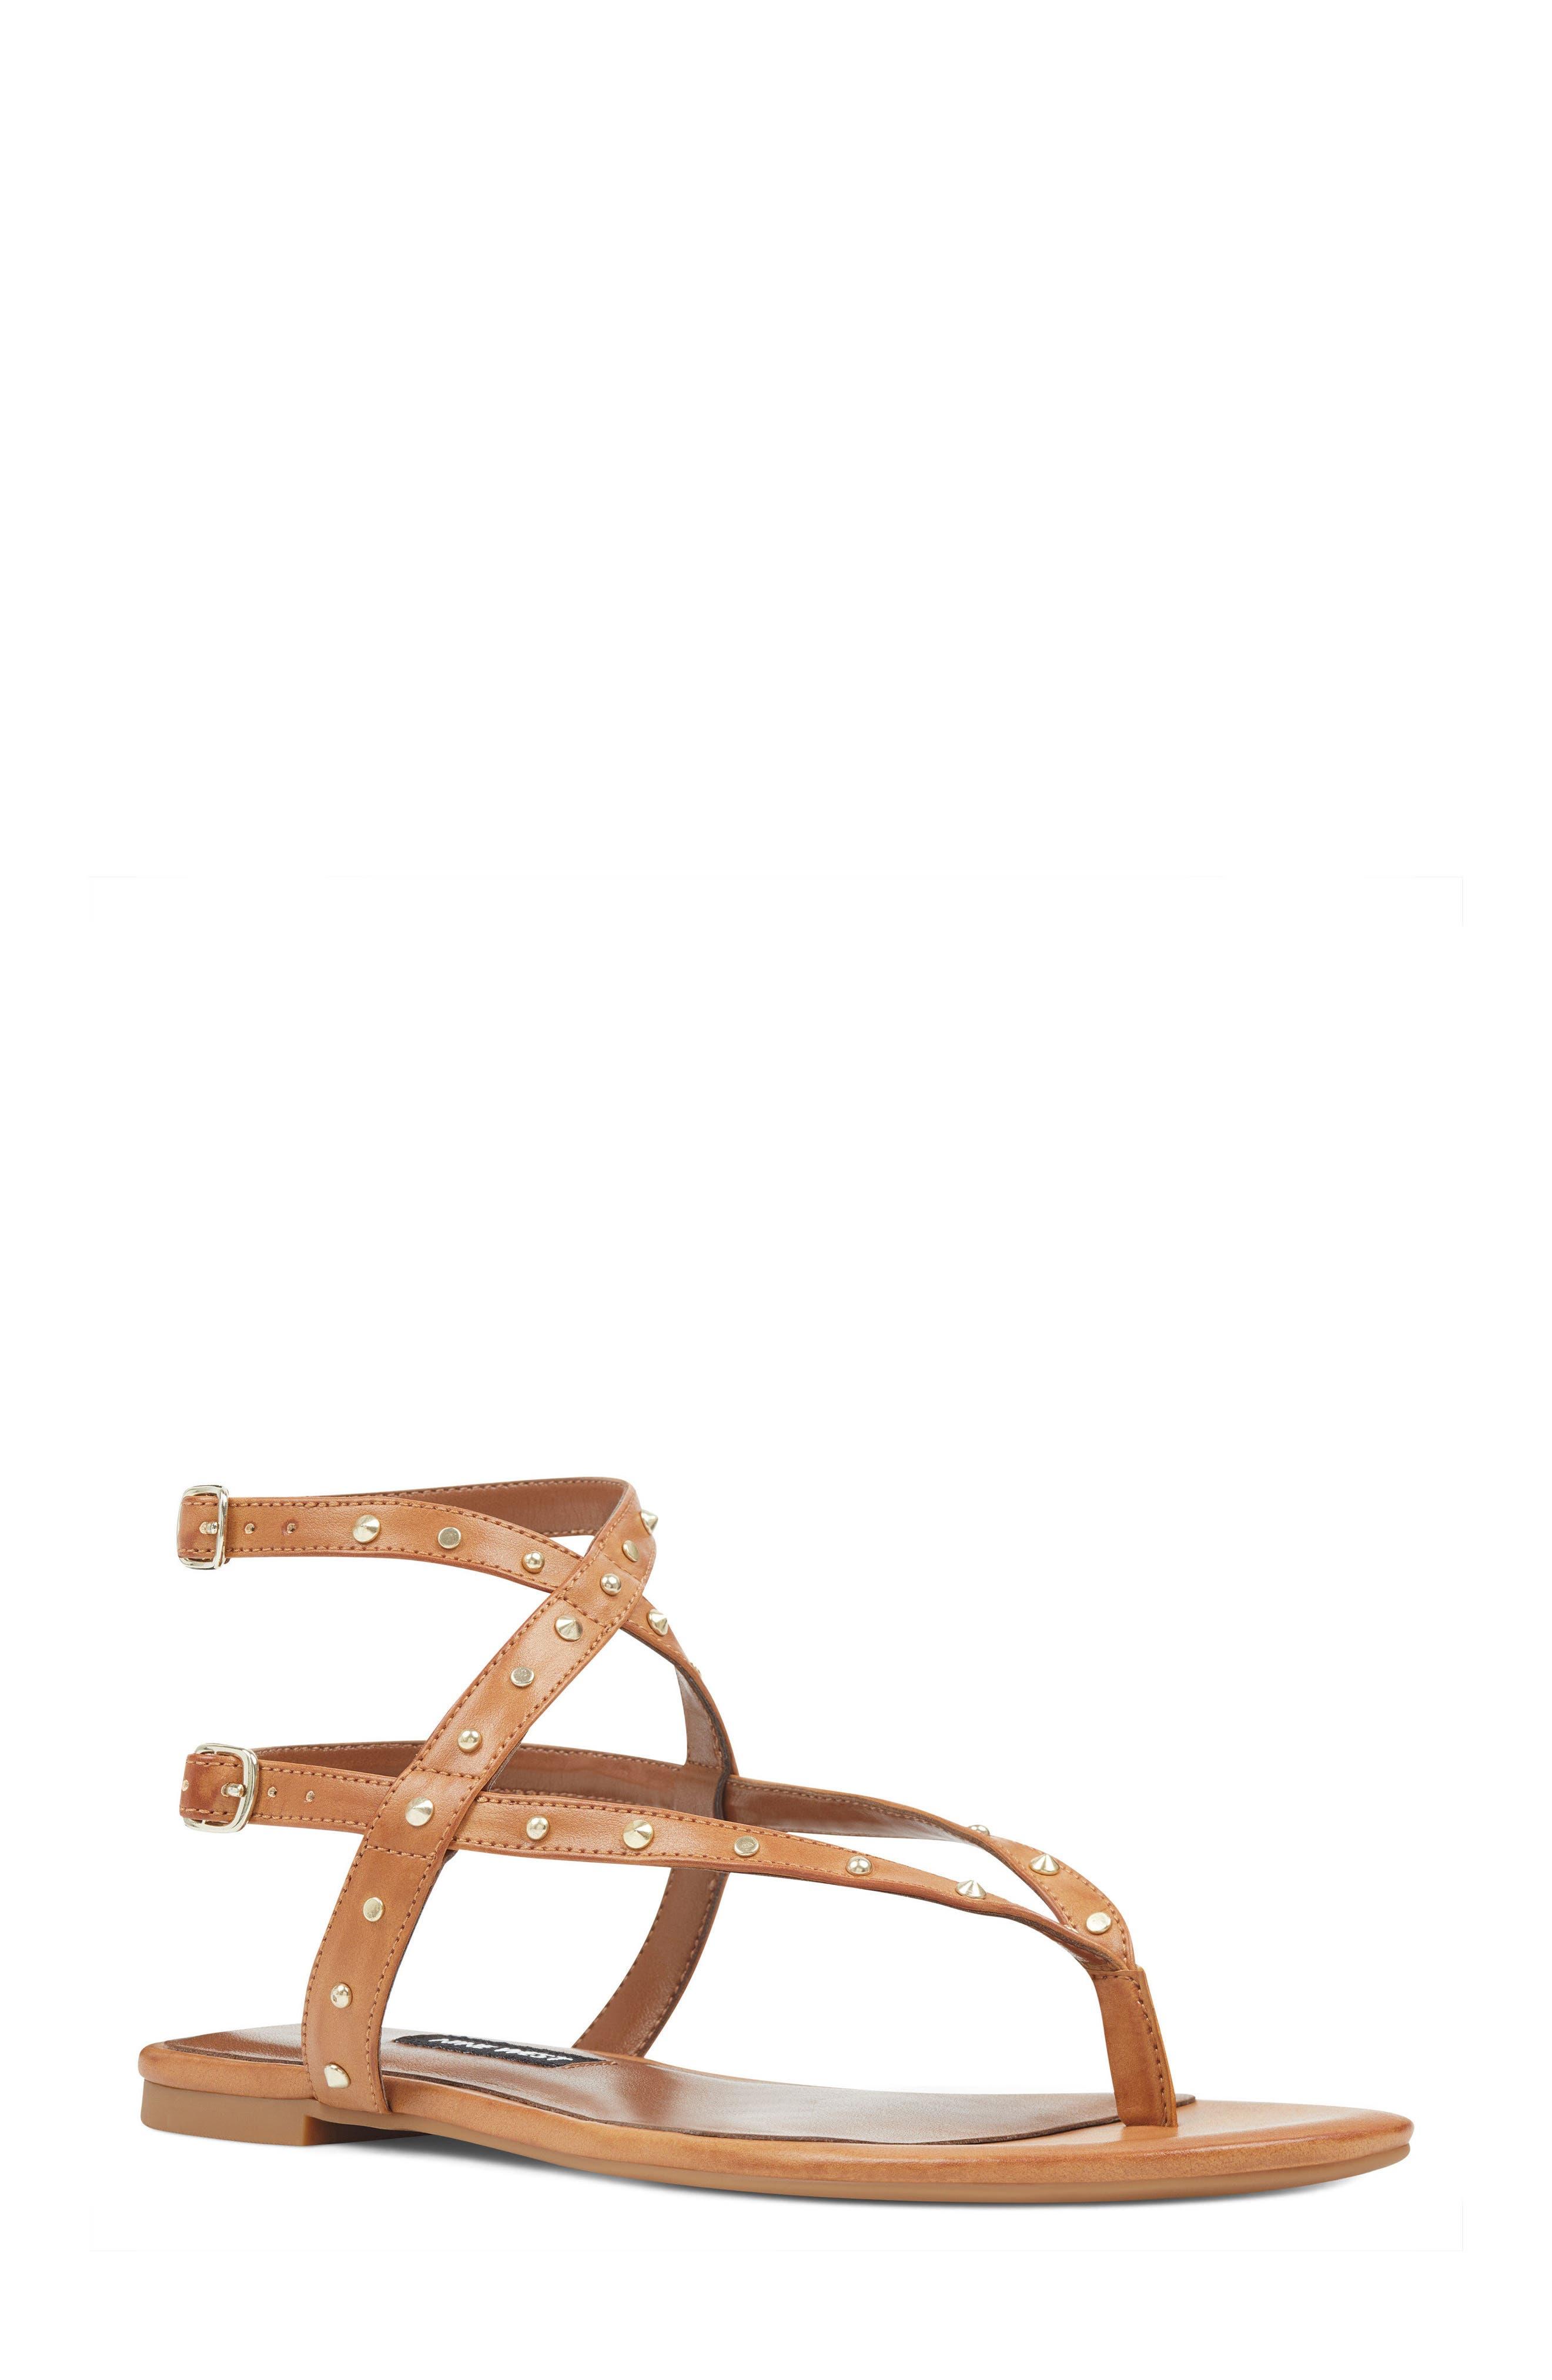 Simcha Studded Wraparound Sandal,                             Main thumbnail 1, color,                             Dark Natural Faux Leather